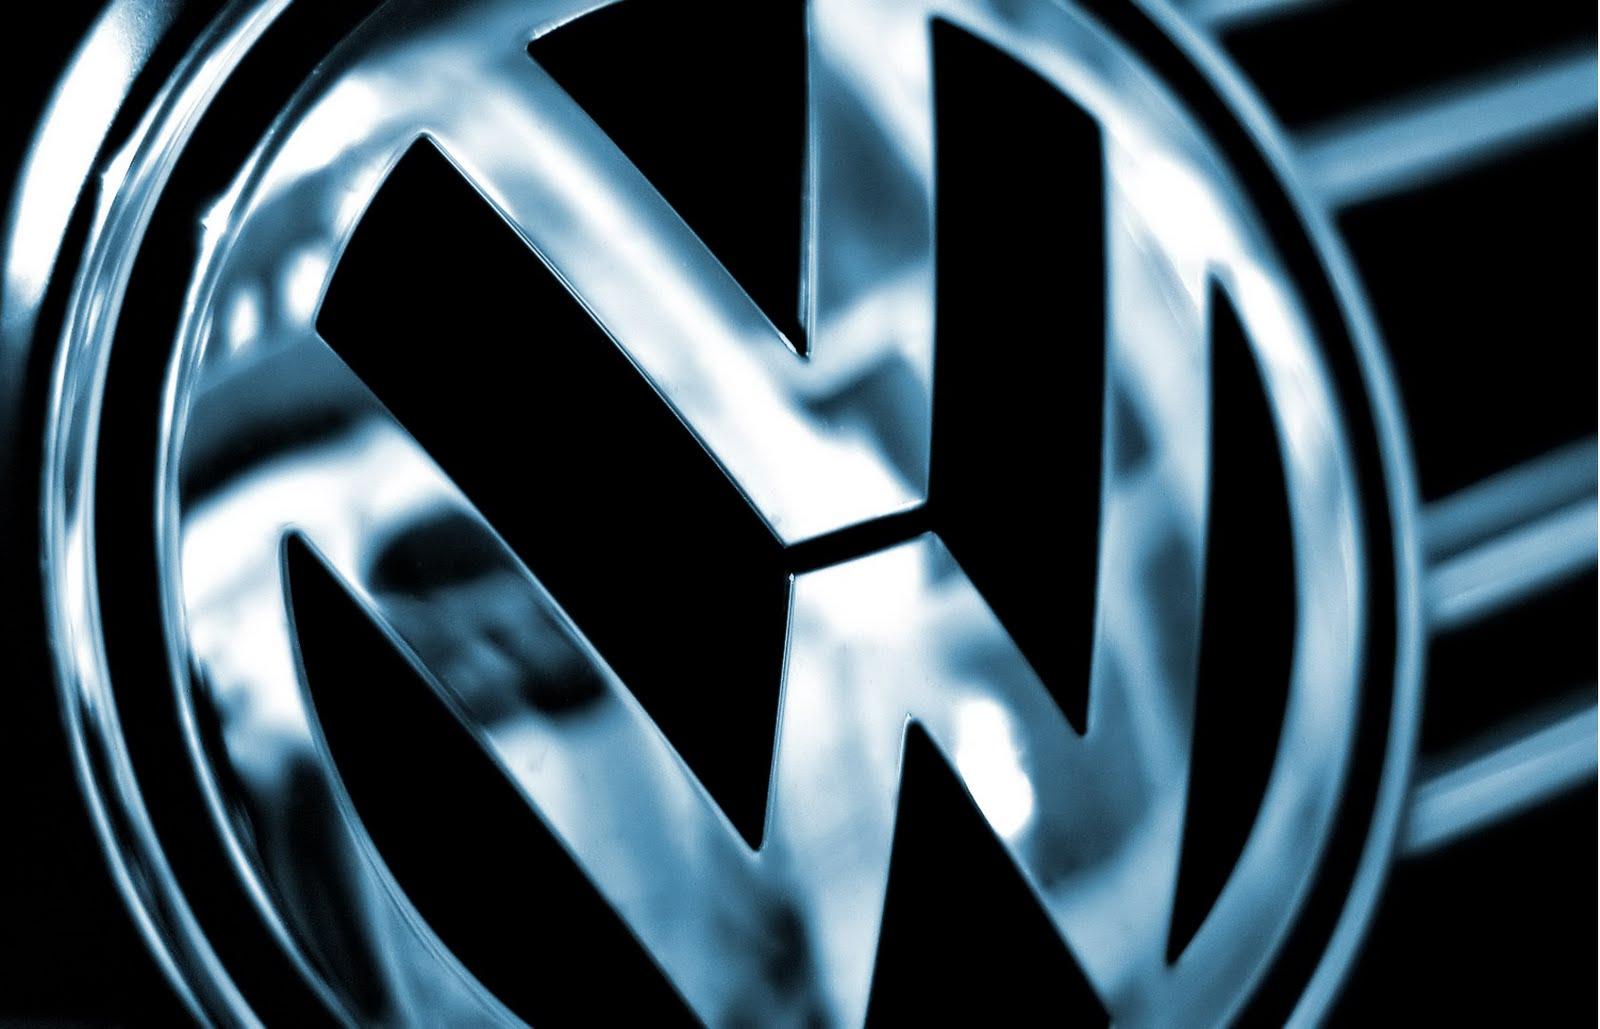 Automotive Magazine: VW Logo - Volkswagen Car Company Symbol